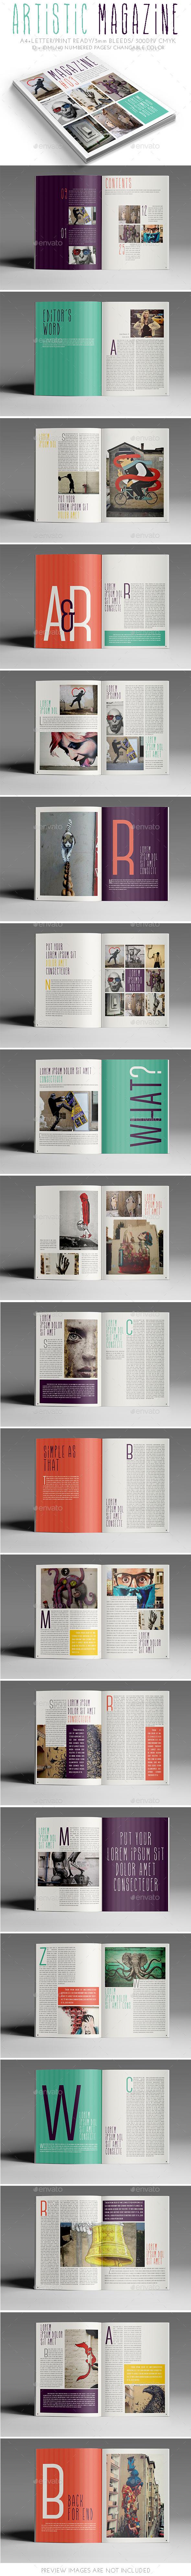 Artistic Magazine - Magazines Print Templates